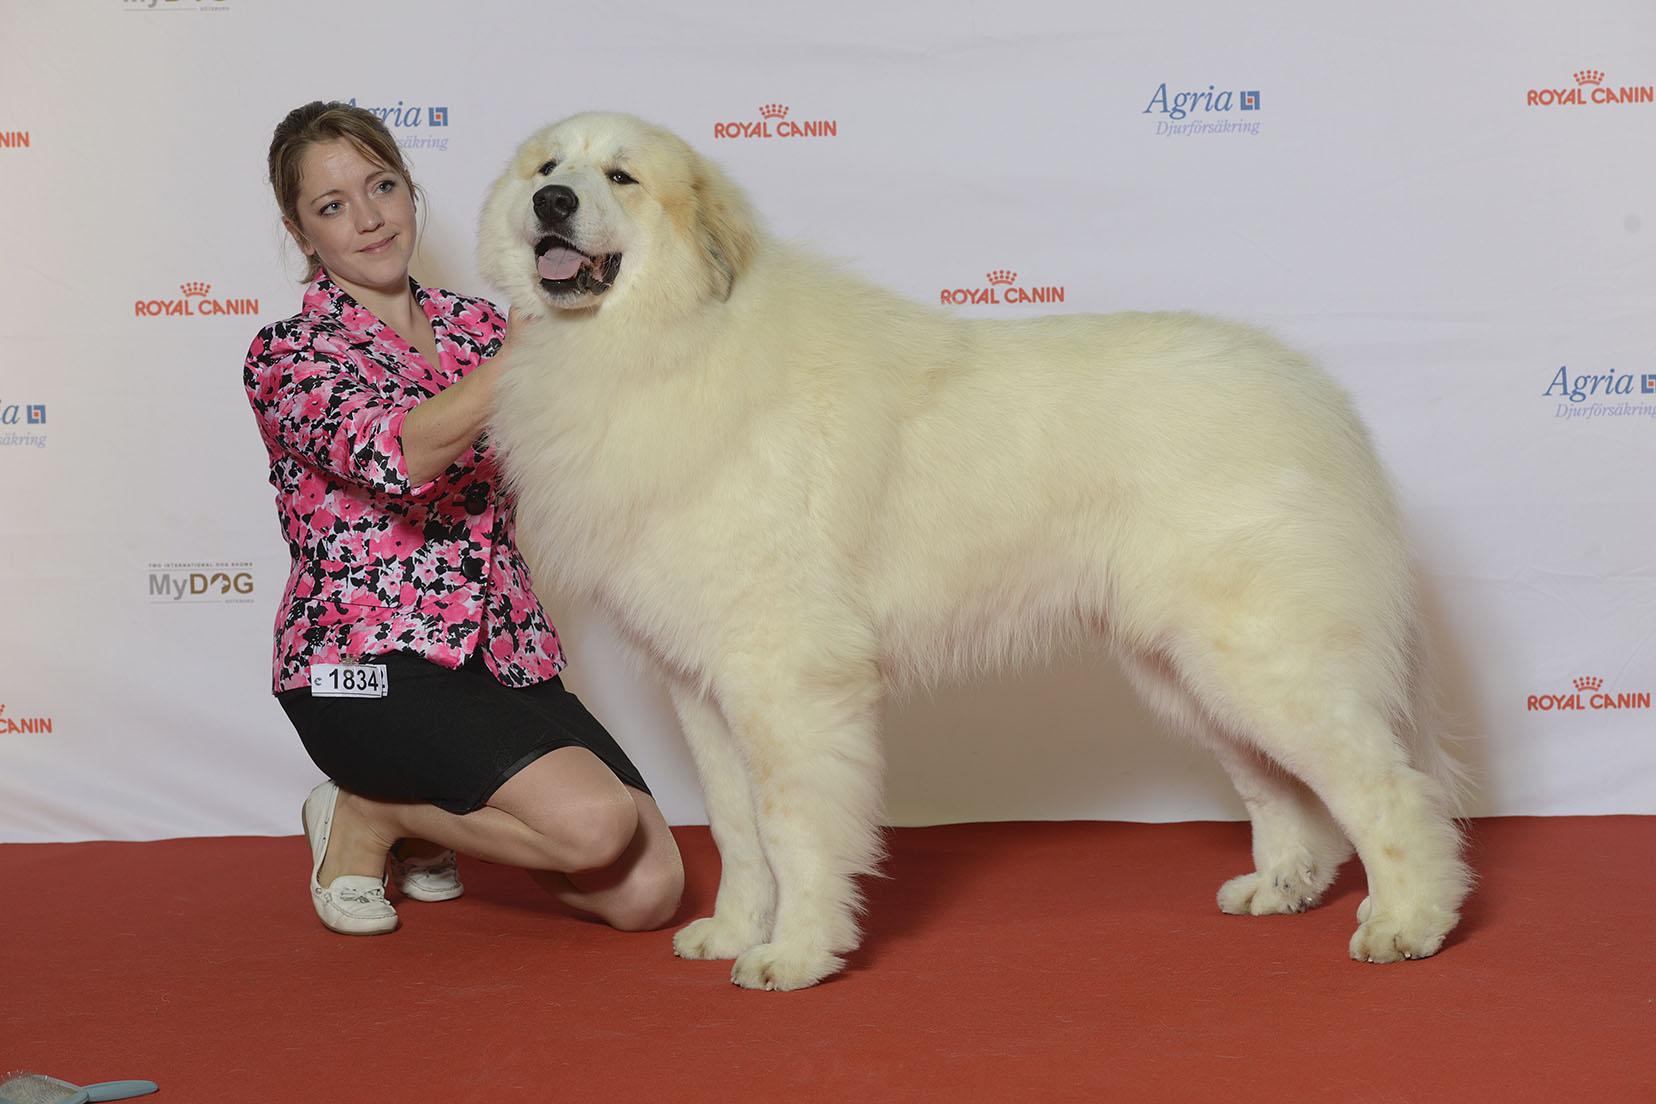 Världens största hund - Pyreneerhund